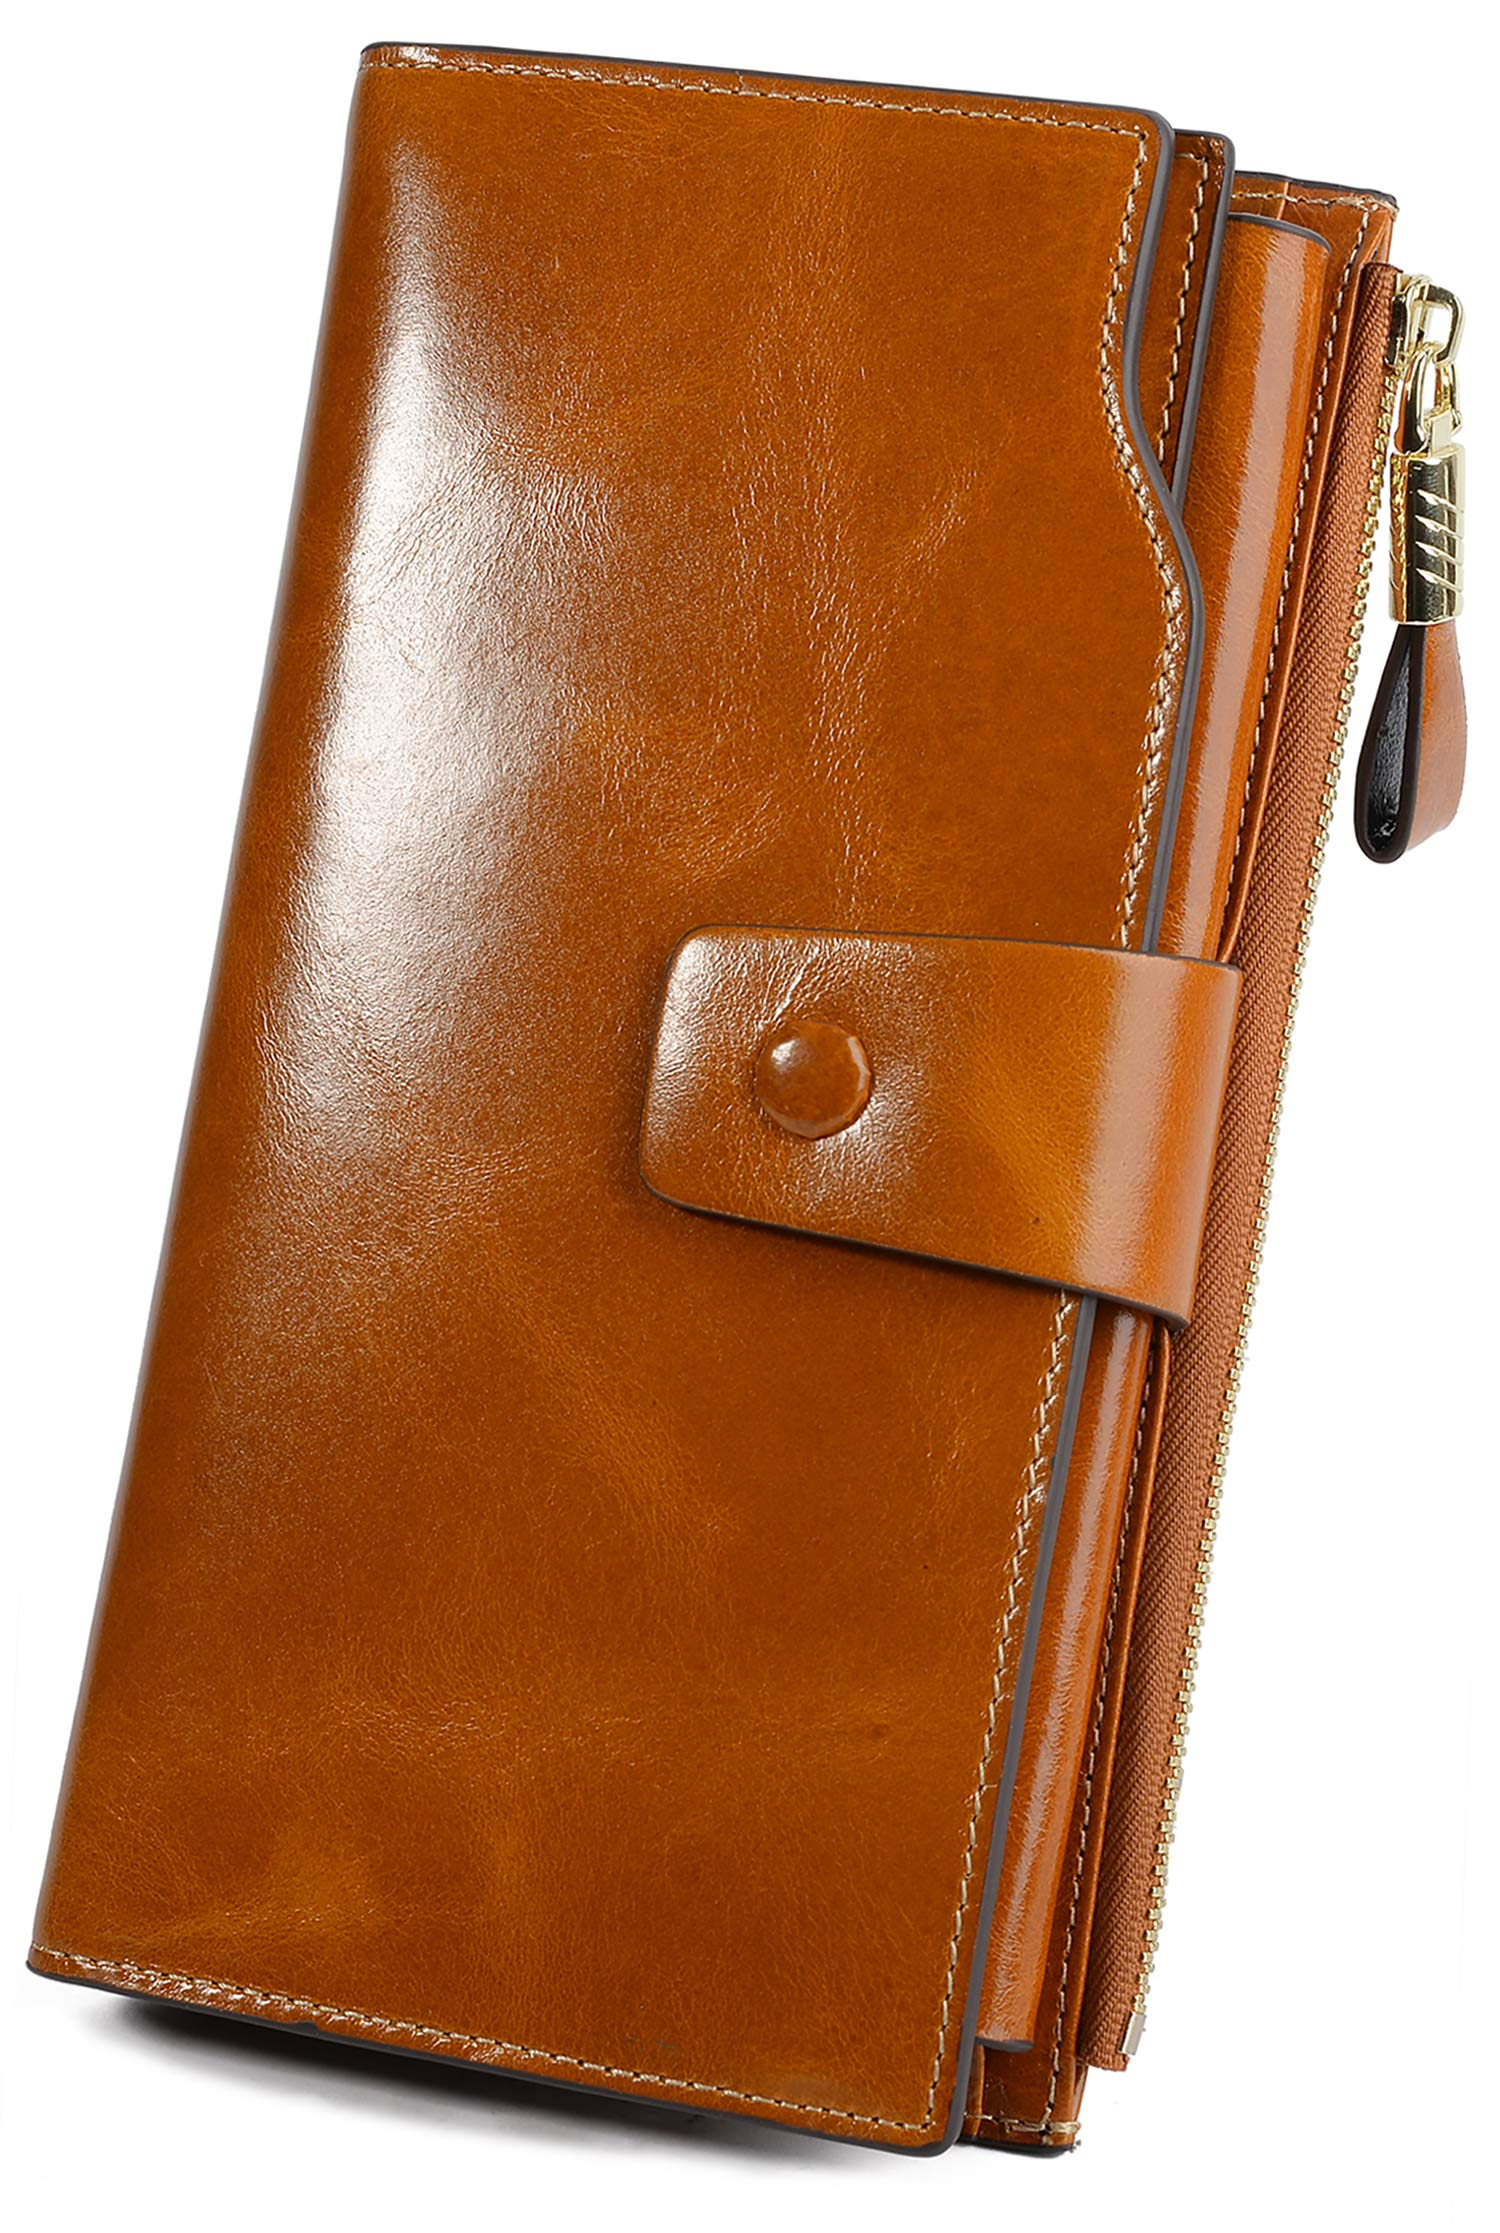 YALUXE Women's Wax Genuine Leather RFID Blocking Large Capacity Luxury Clutch Wallet Card Holder Organizer Ladies Purse Wallets for women brown by YALUXE